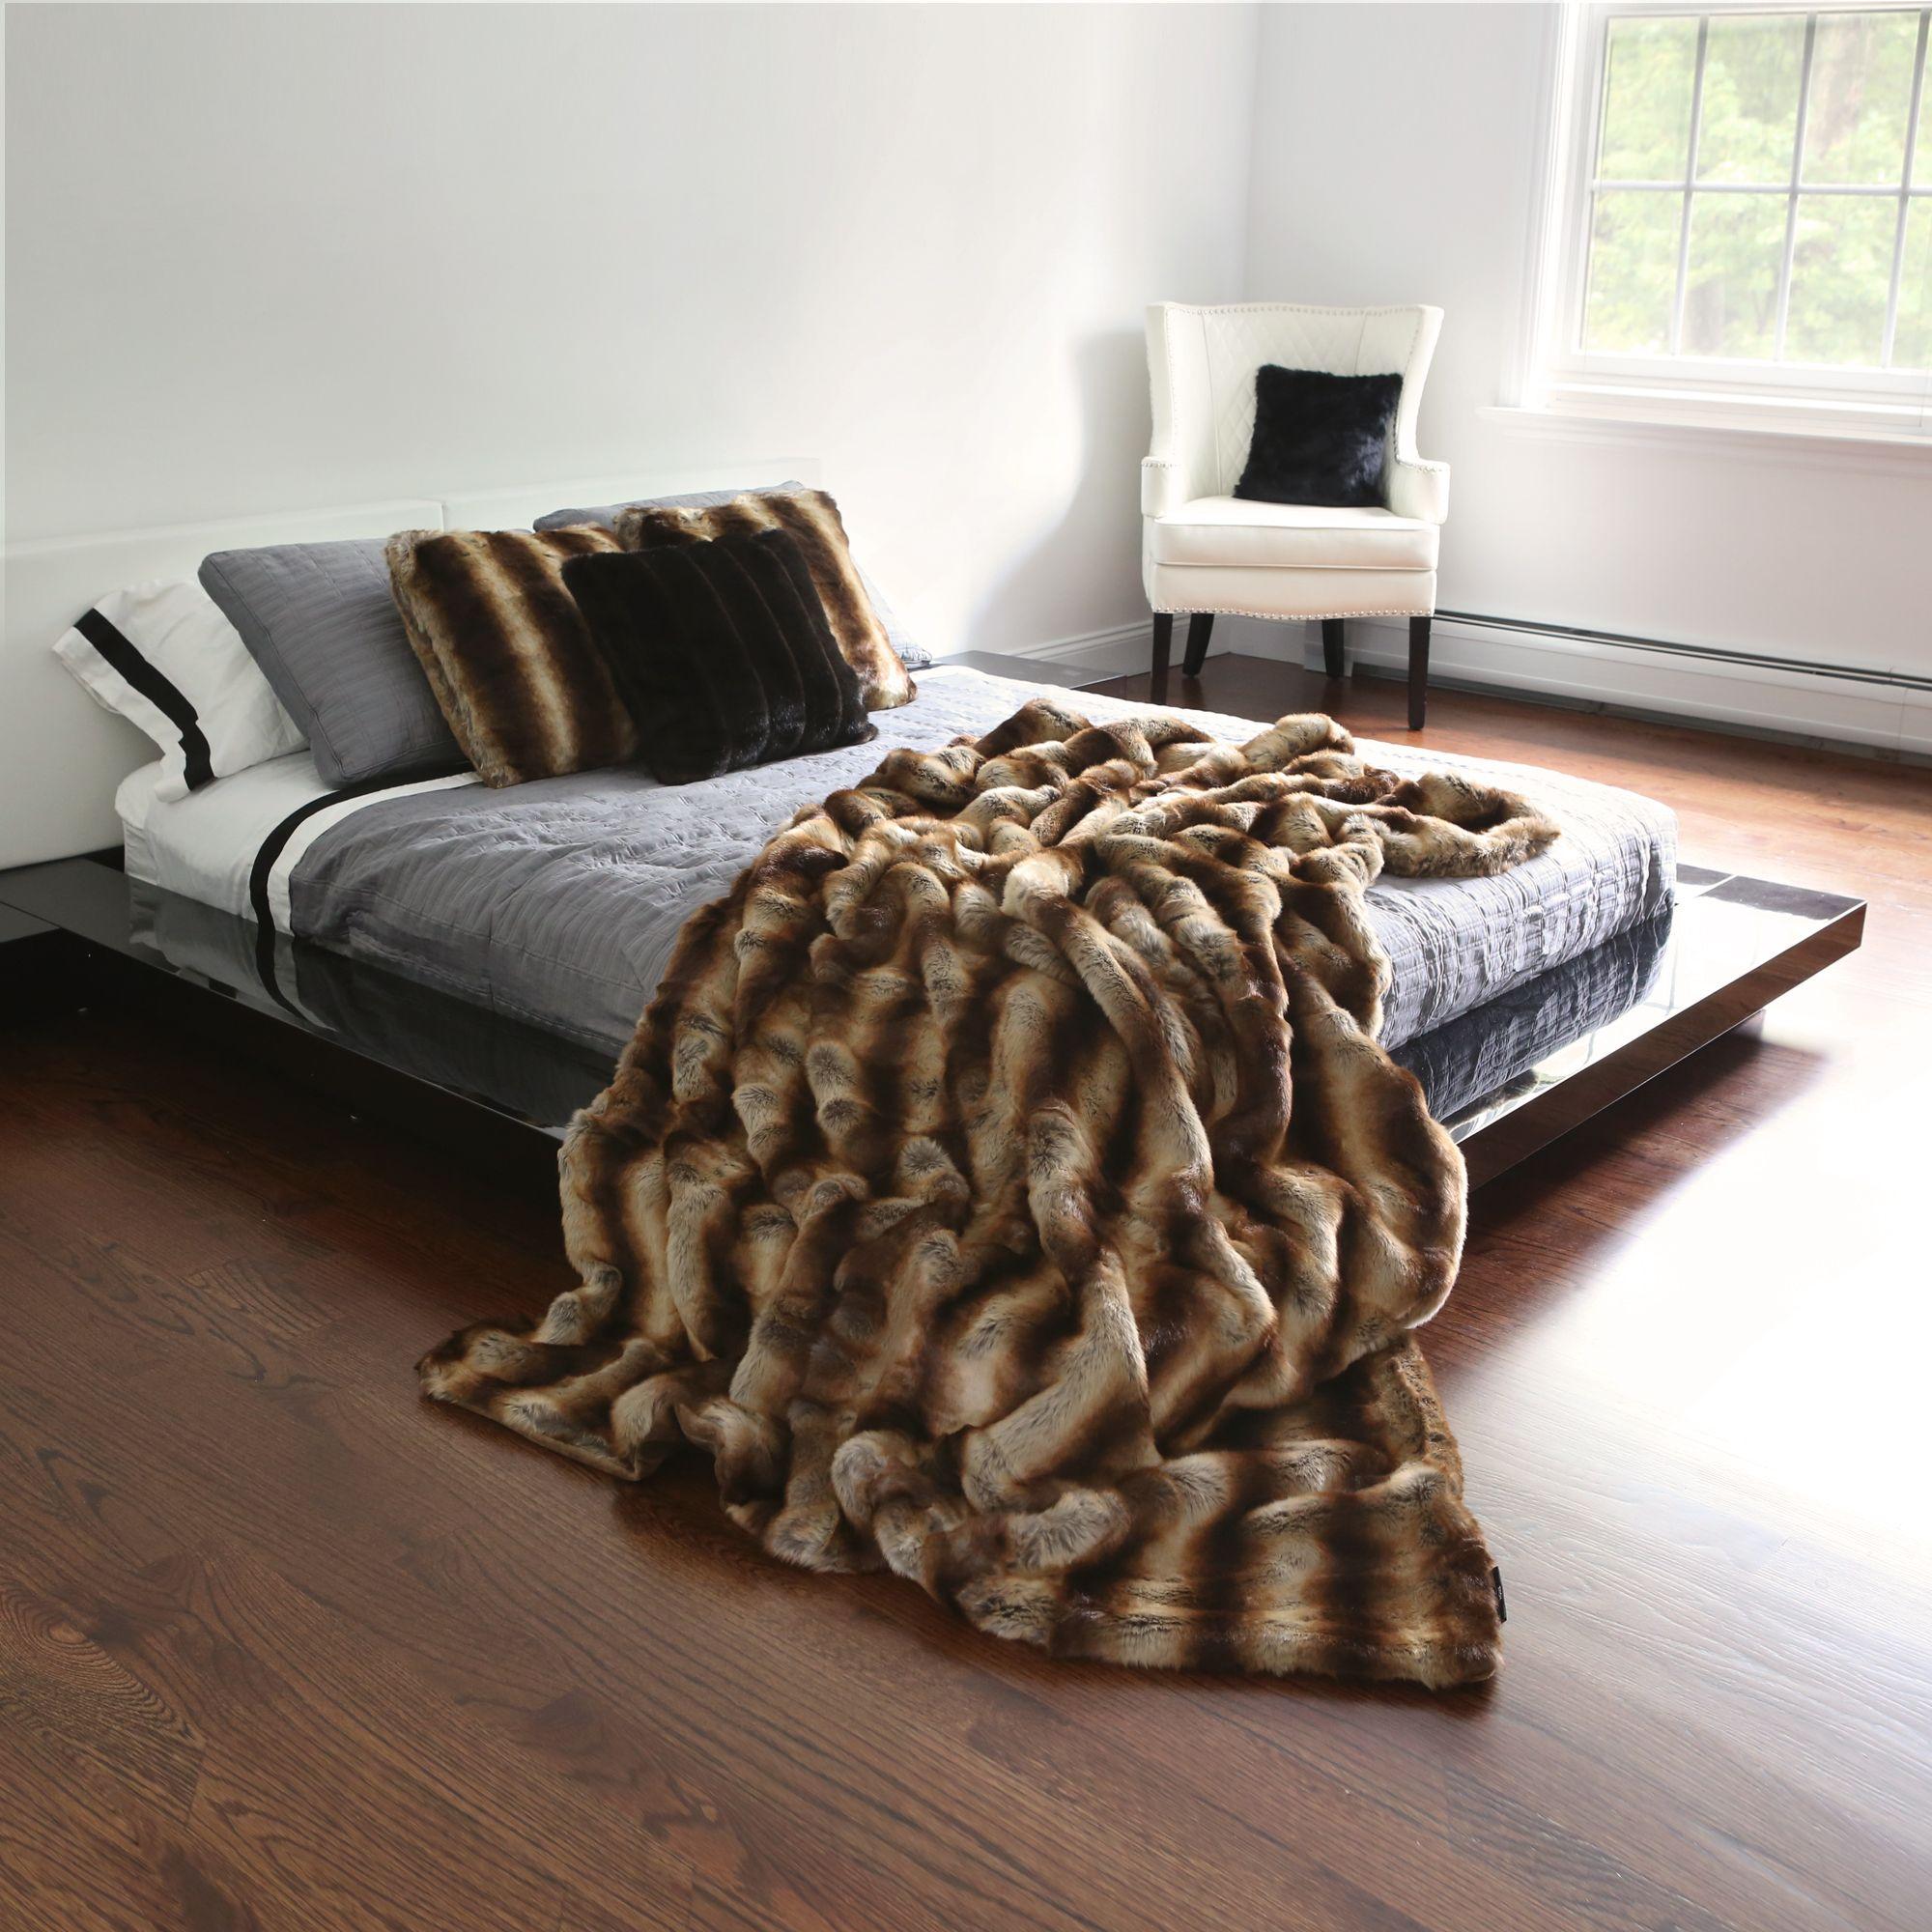 fur bed throw luxury bedding product faux throws indigo